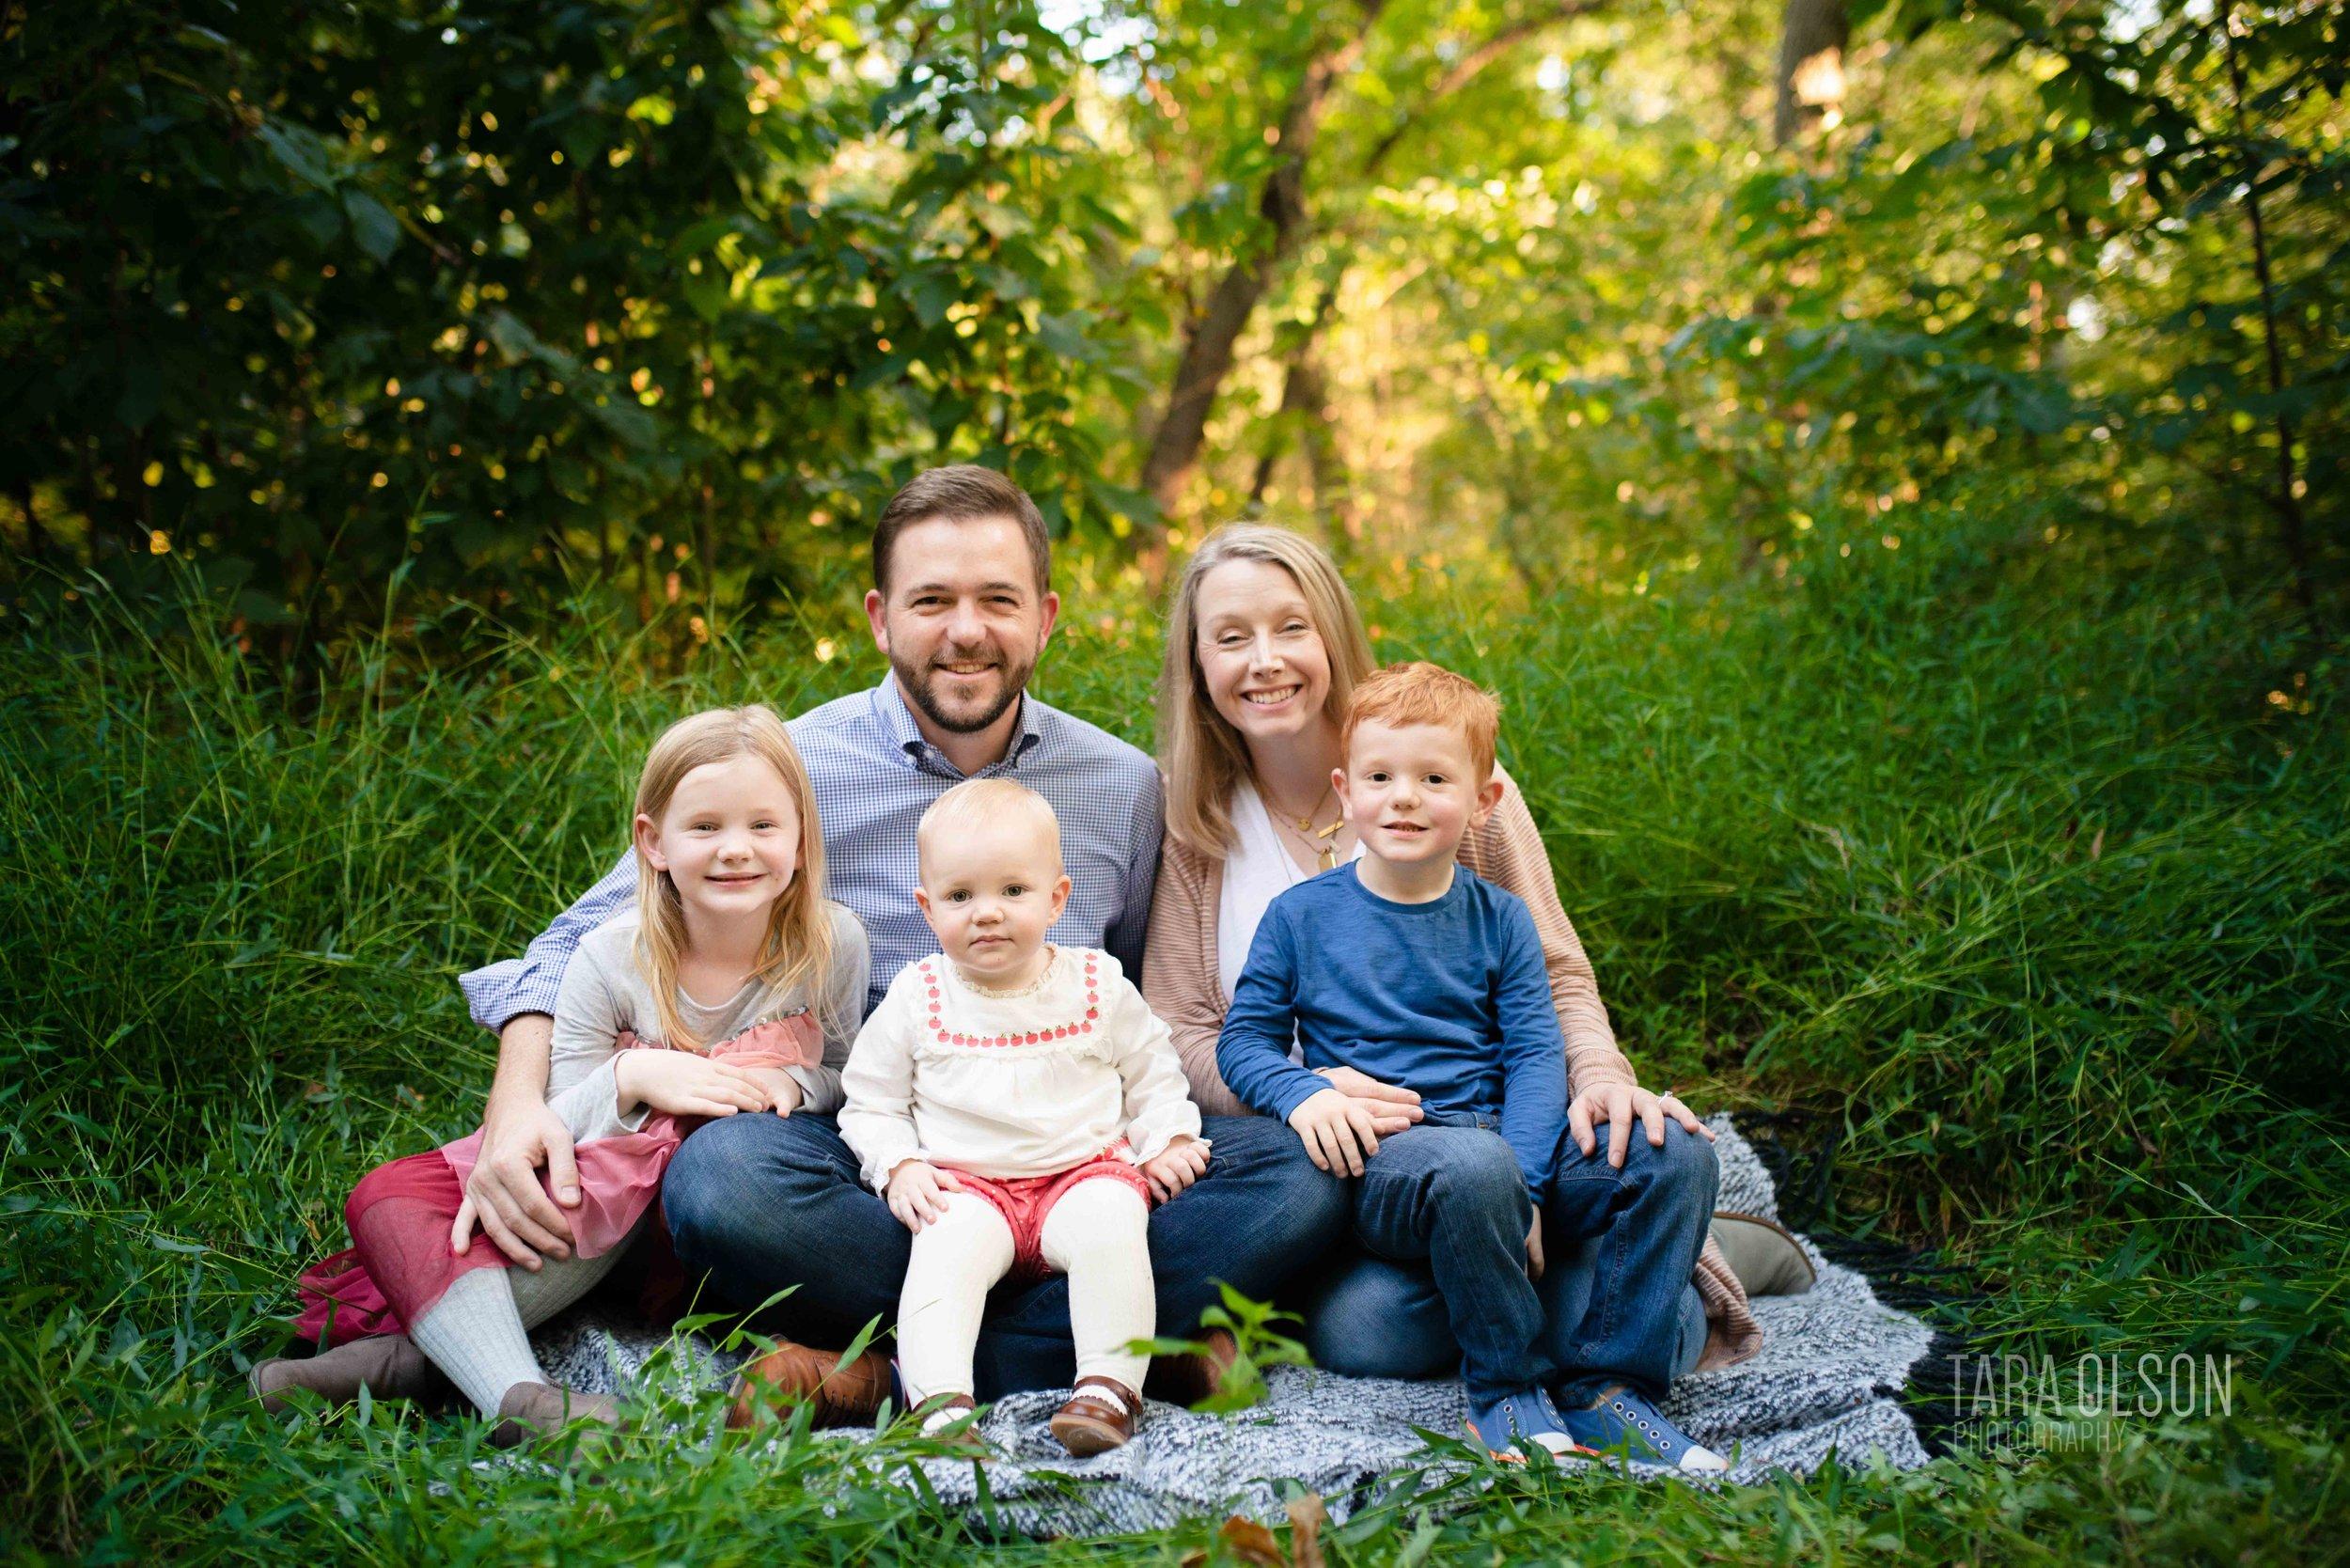 Hawkins_Arlington-Virginia-Family-Photographer_Tara-Olson-Photography_4067.jpg